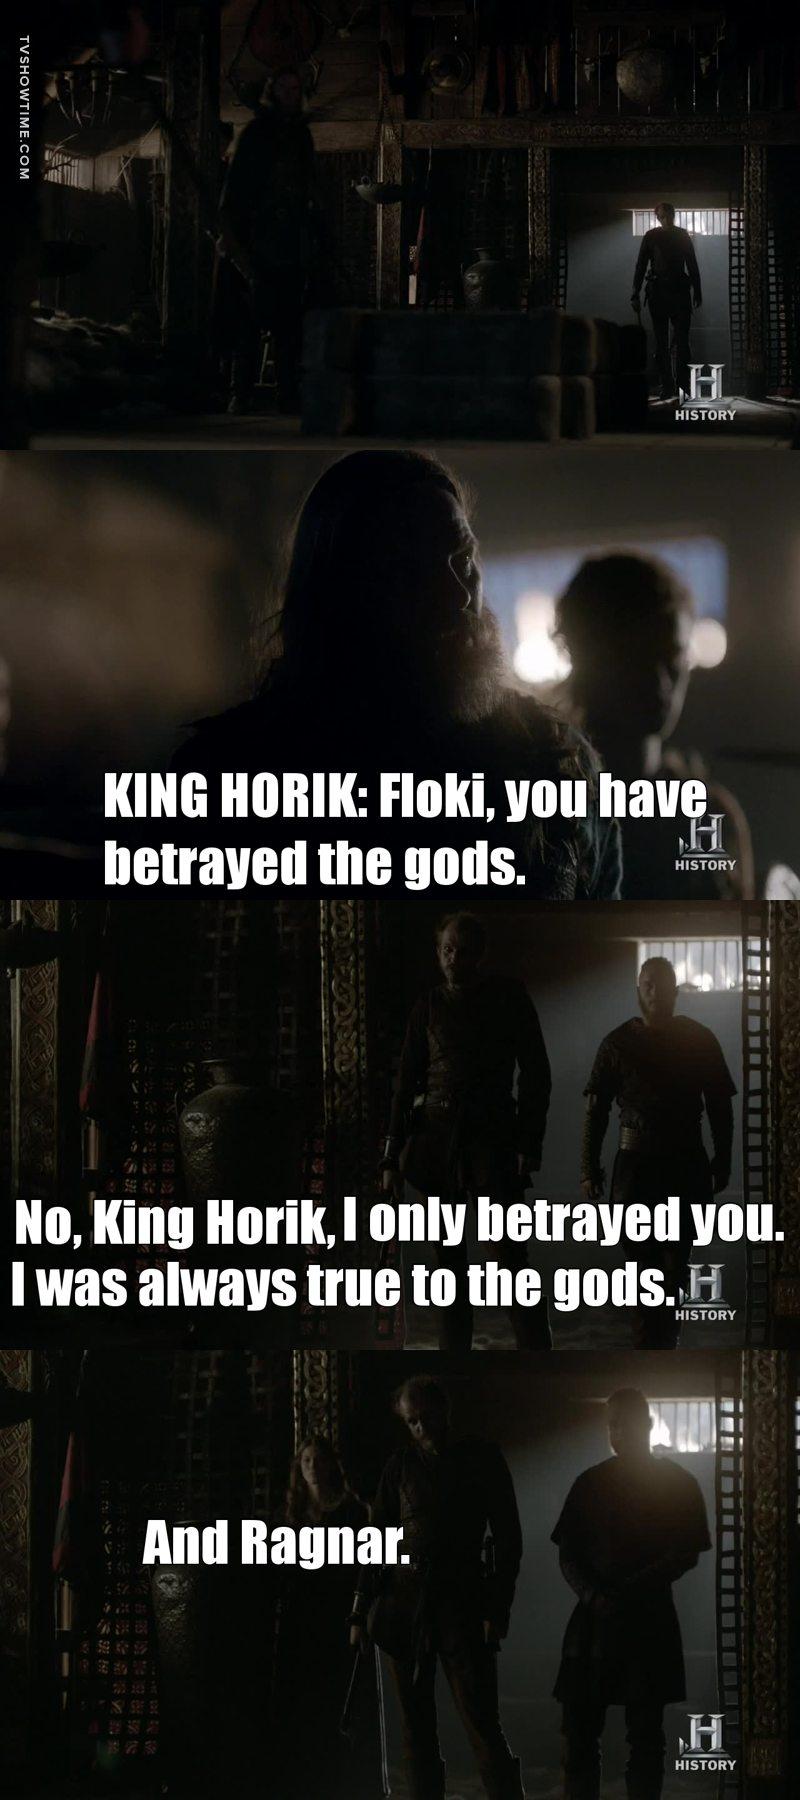 I knew it, I knew it. Floki isn't a traitor.